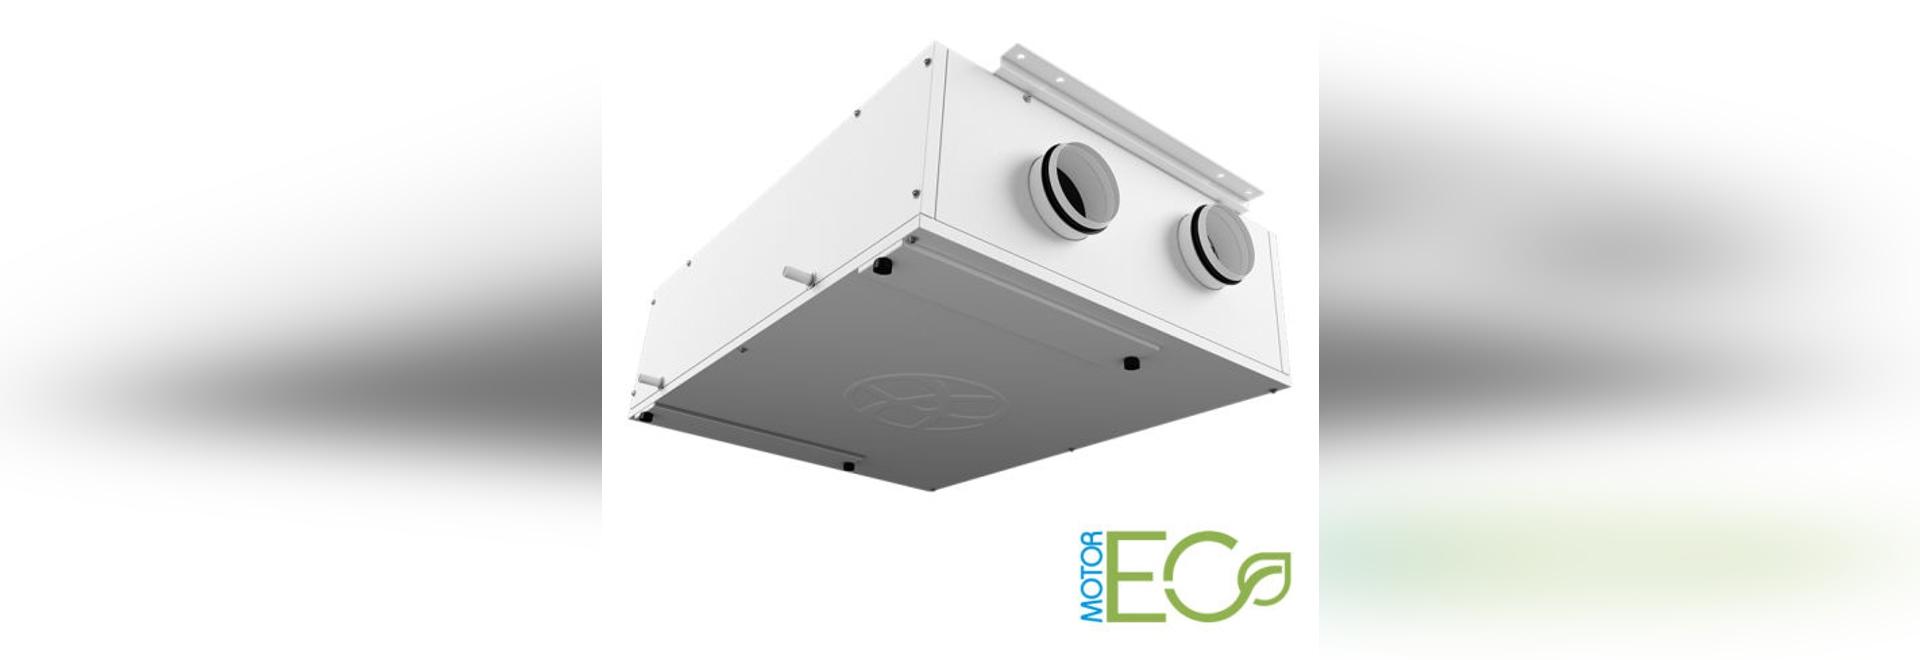 NEW: centralized controlled mechanical ventilation by Blauberg Ventilatoren GmbH